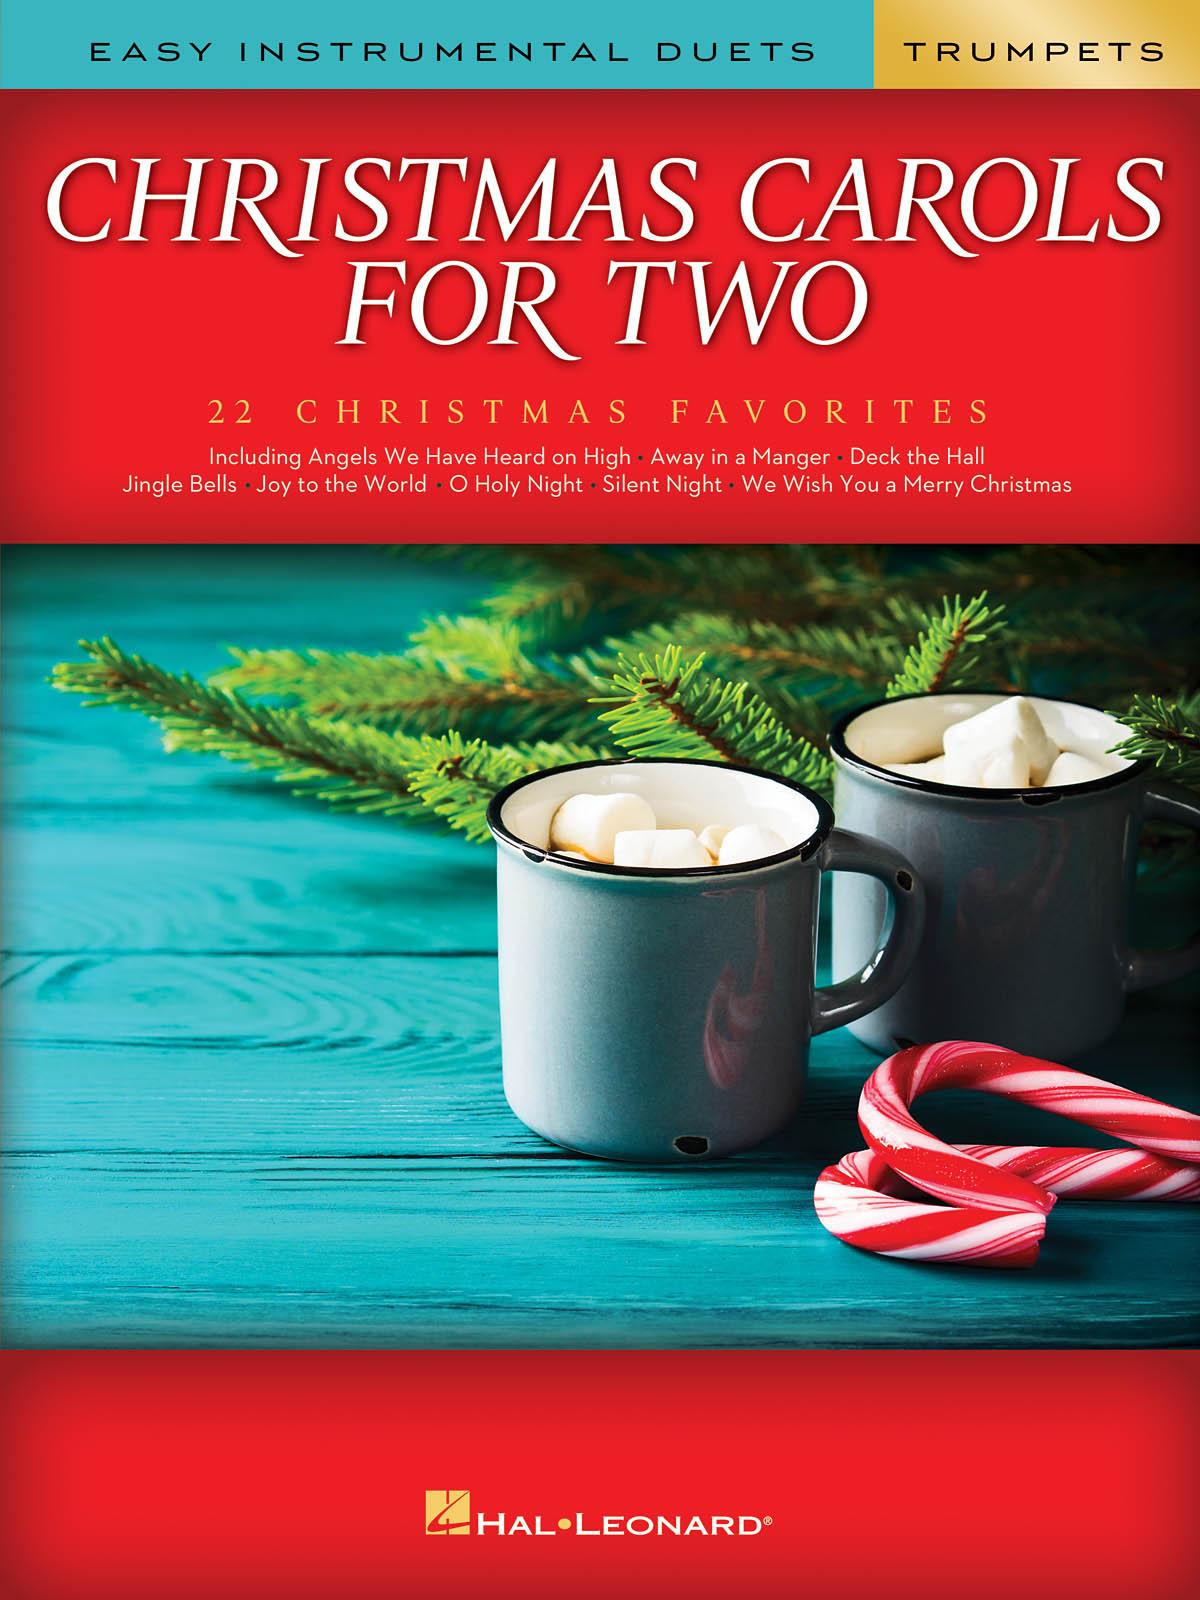 Christmas Carols for Two Trumpets: Trumpet Solo: Instrumental Album